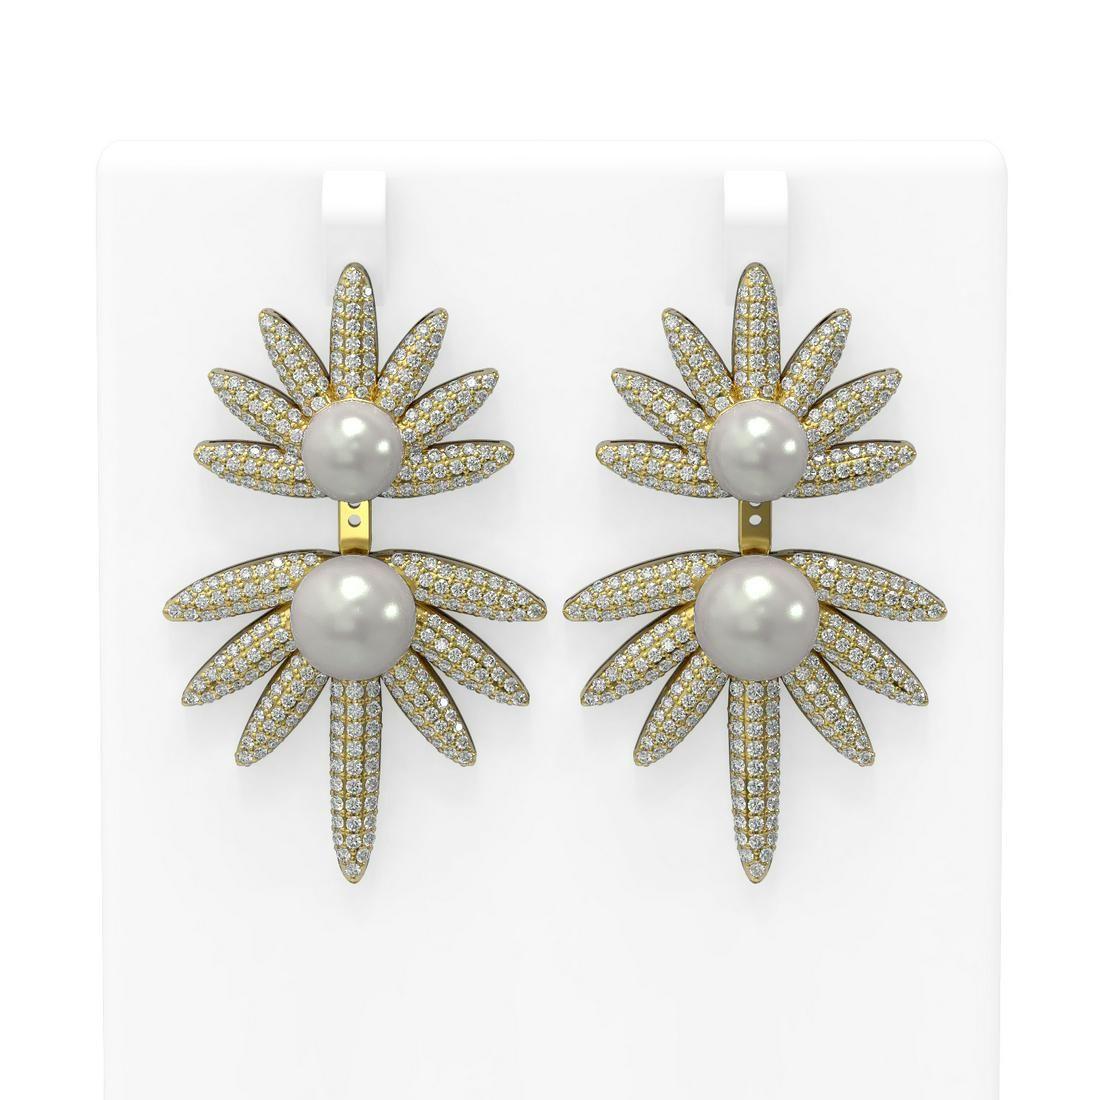 8 ctw Diamond & Pearl Earrings 18K Yellow Gold -